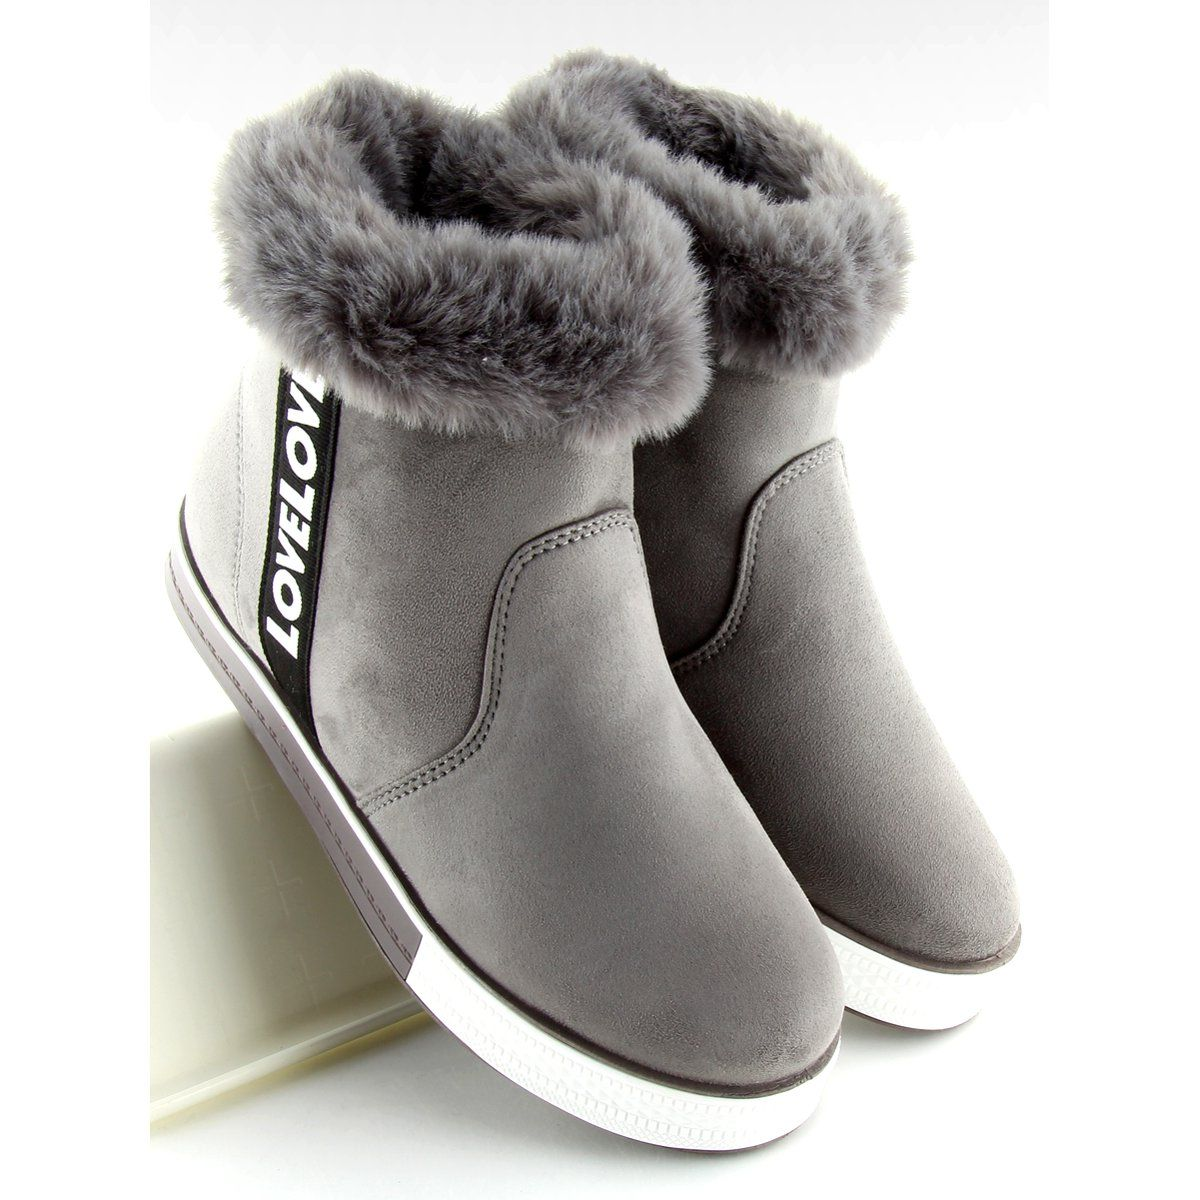 Trampki Za Kostke Ocieplane Szare Nb252p Boots Ugg Boots Slippers